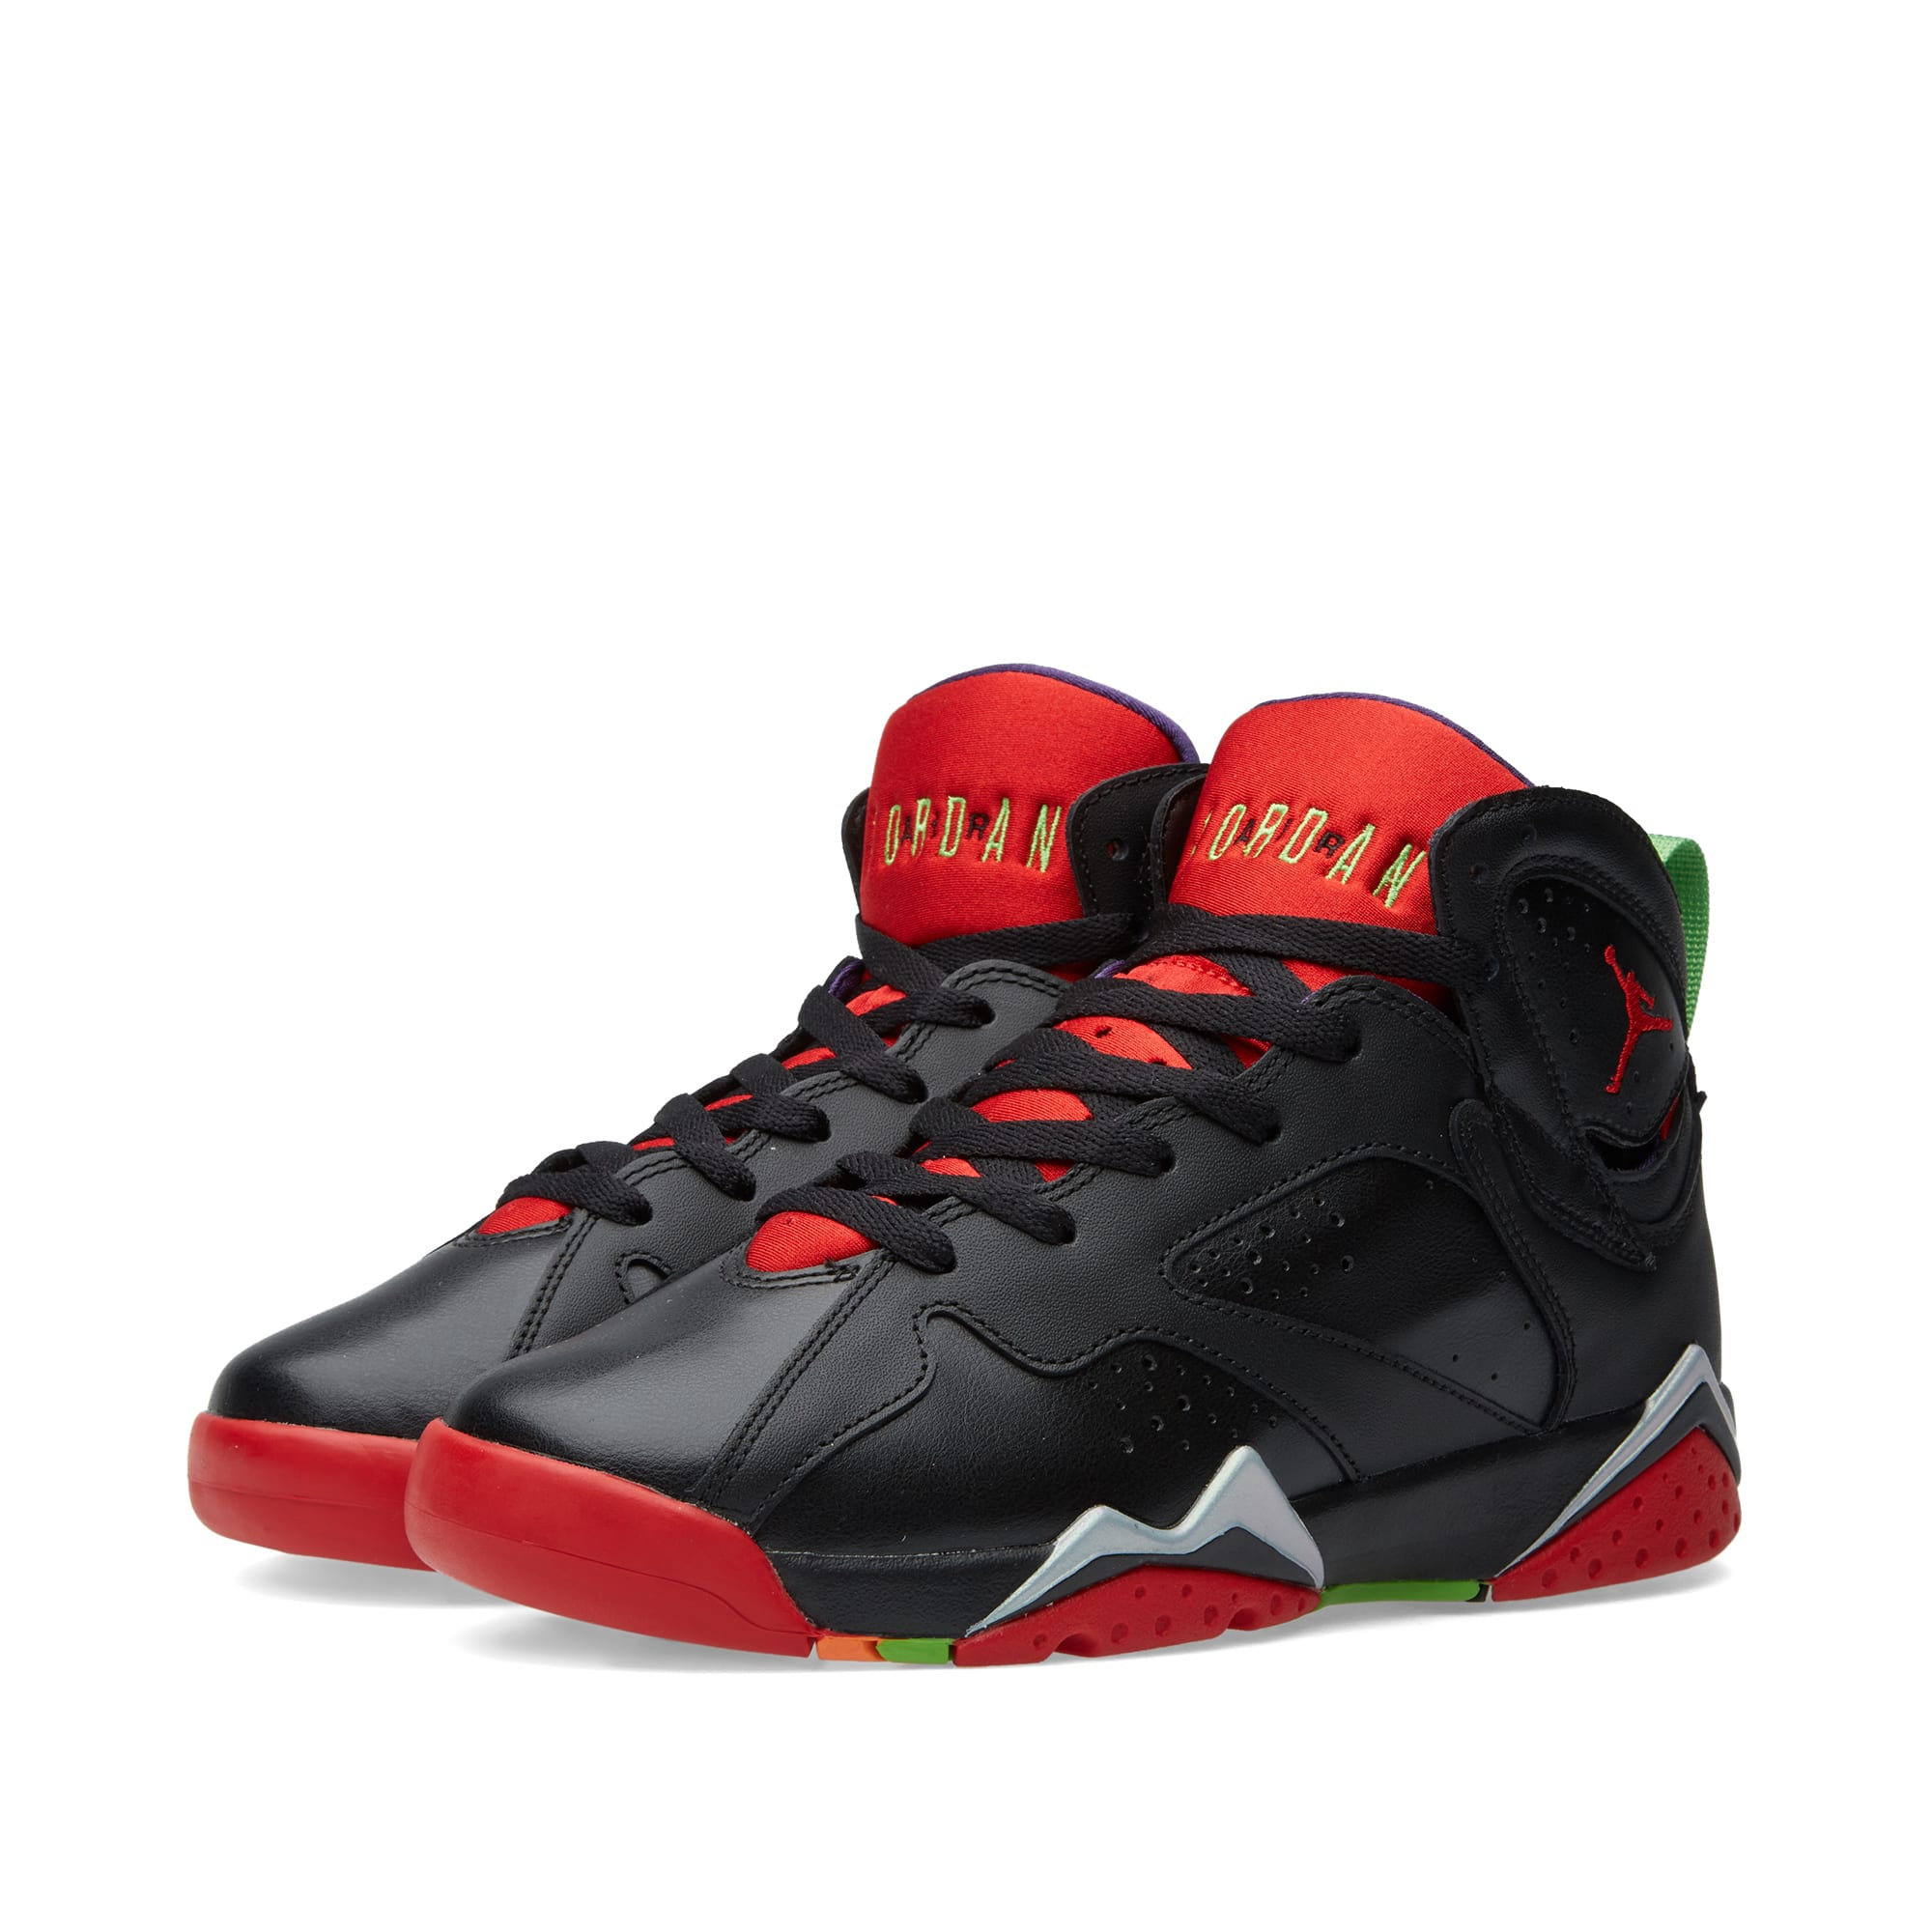 womens air jordan retro 1 red green